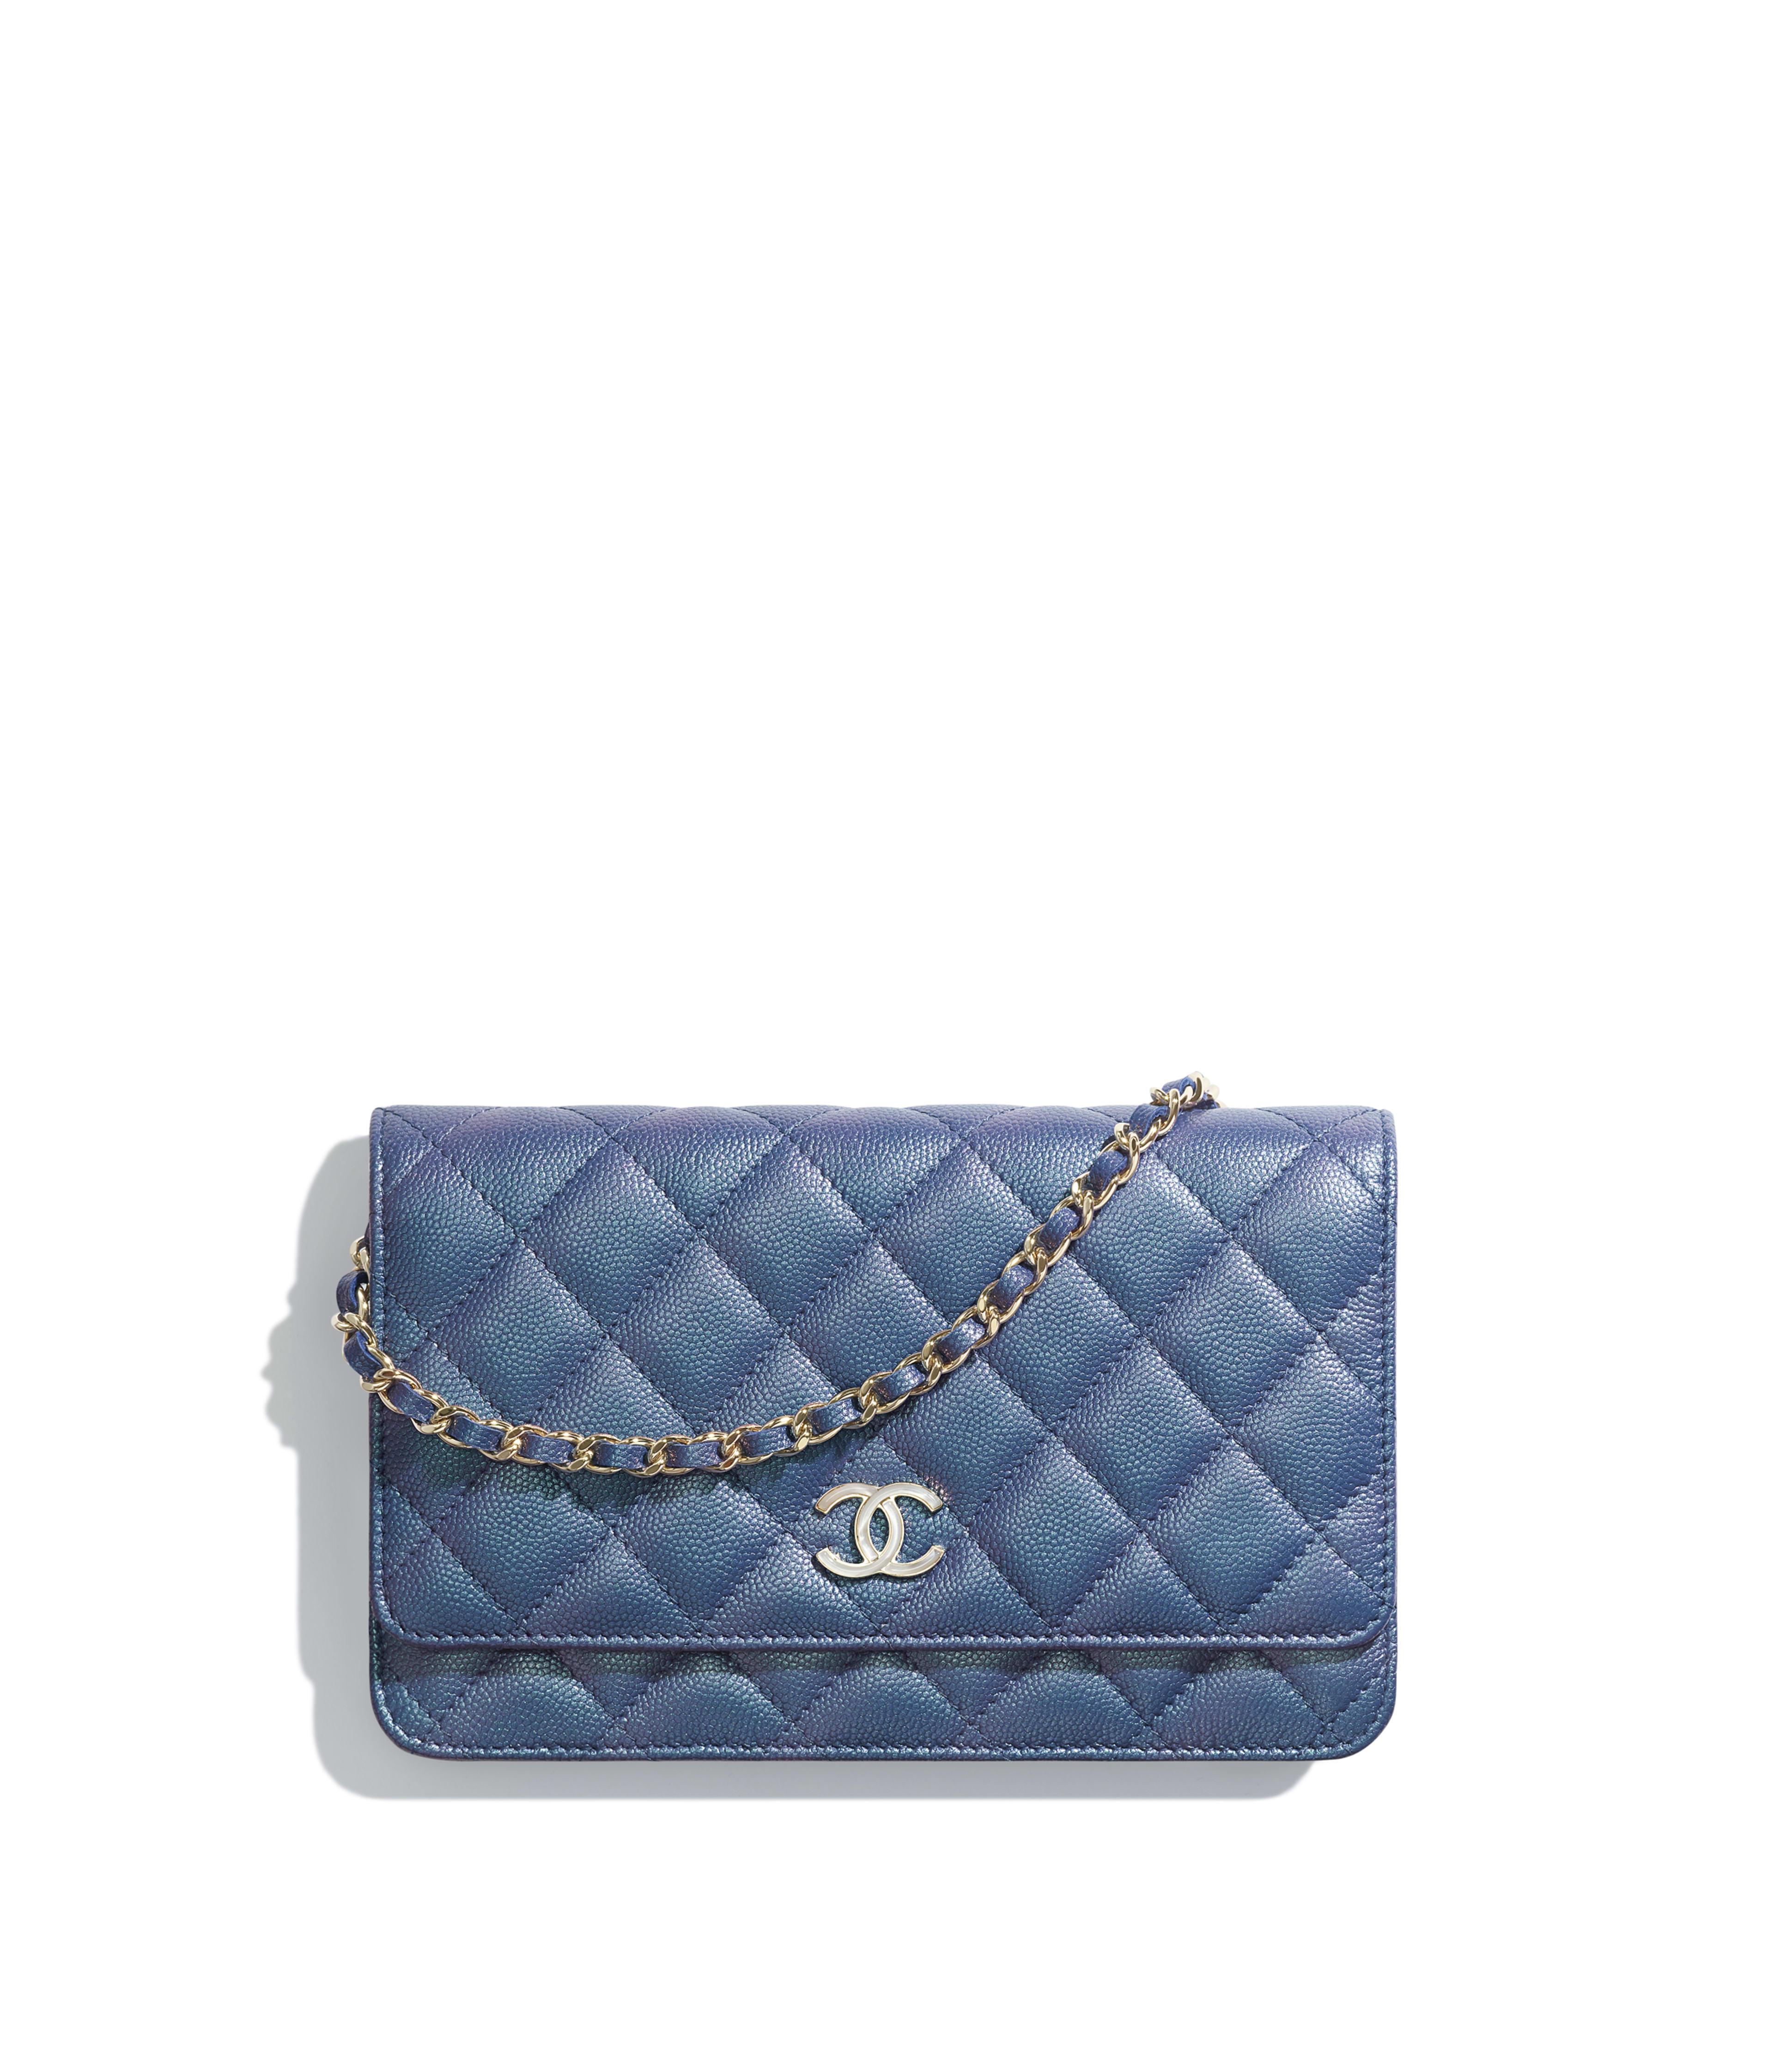 c591ca63021b Wallet on Chain Iridescent Grained Lambskin & Gold-Tone Metal, Dark Blue  Ref. AP0315B00483N0901